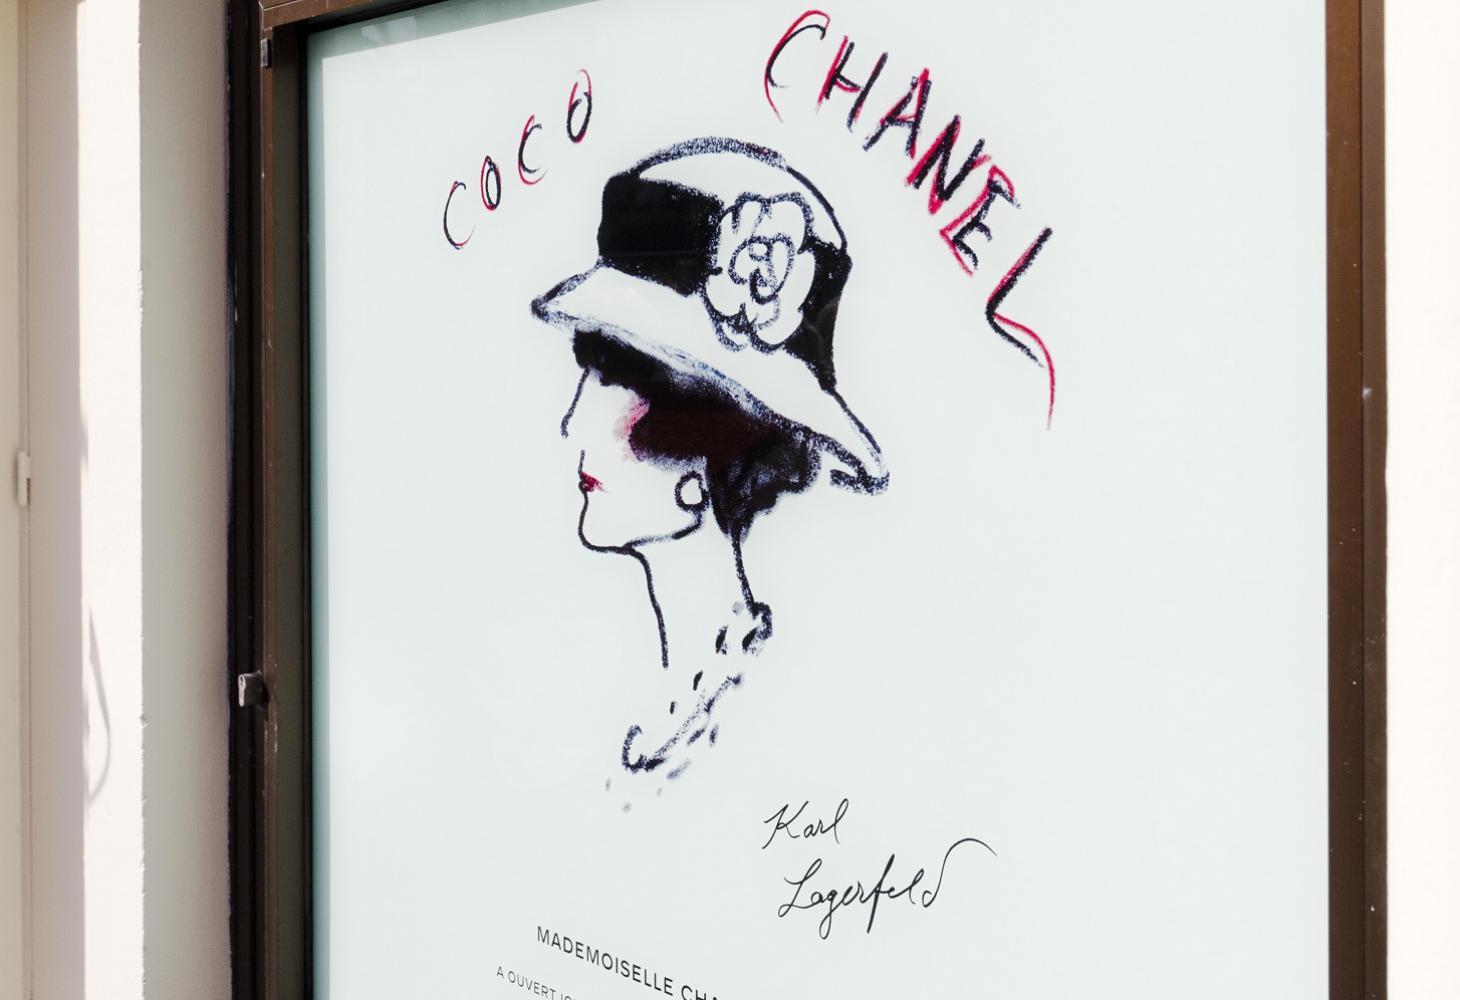 Chanel Plakette